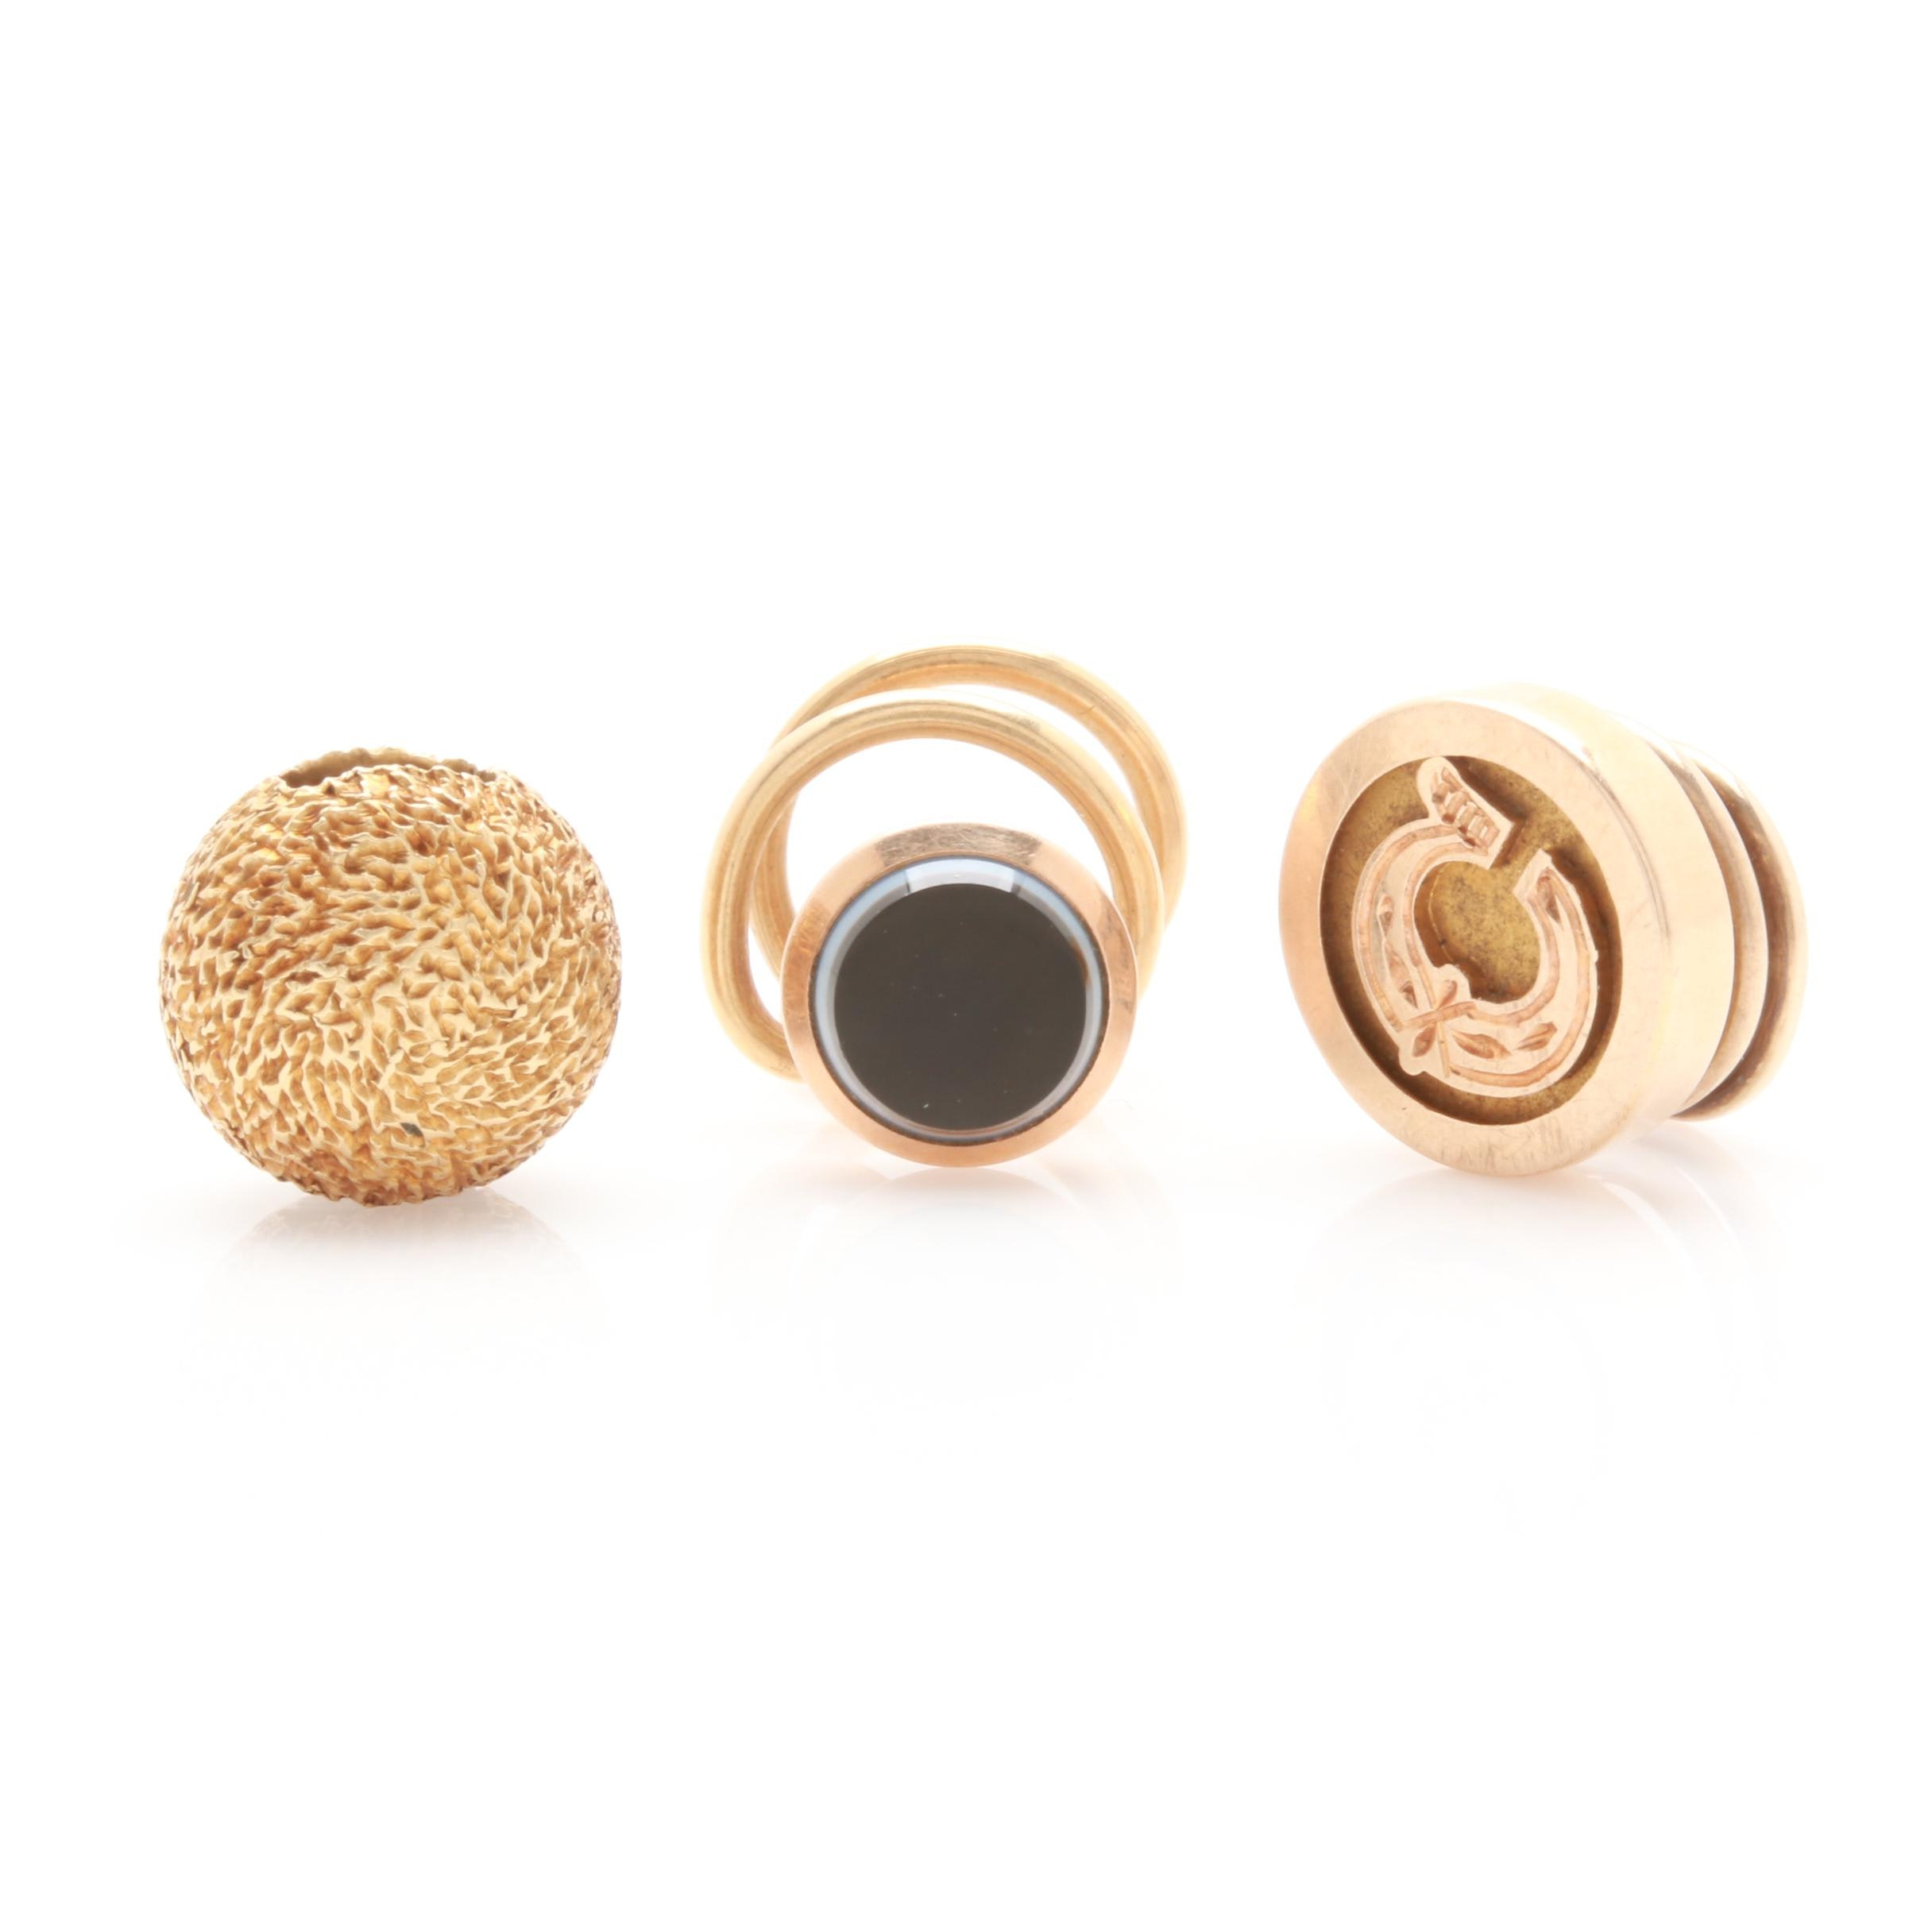 14K Yellow Gold Pins and Bead